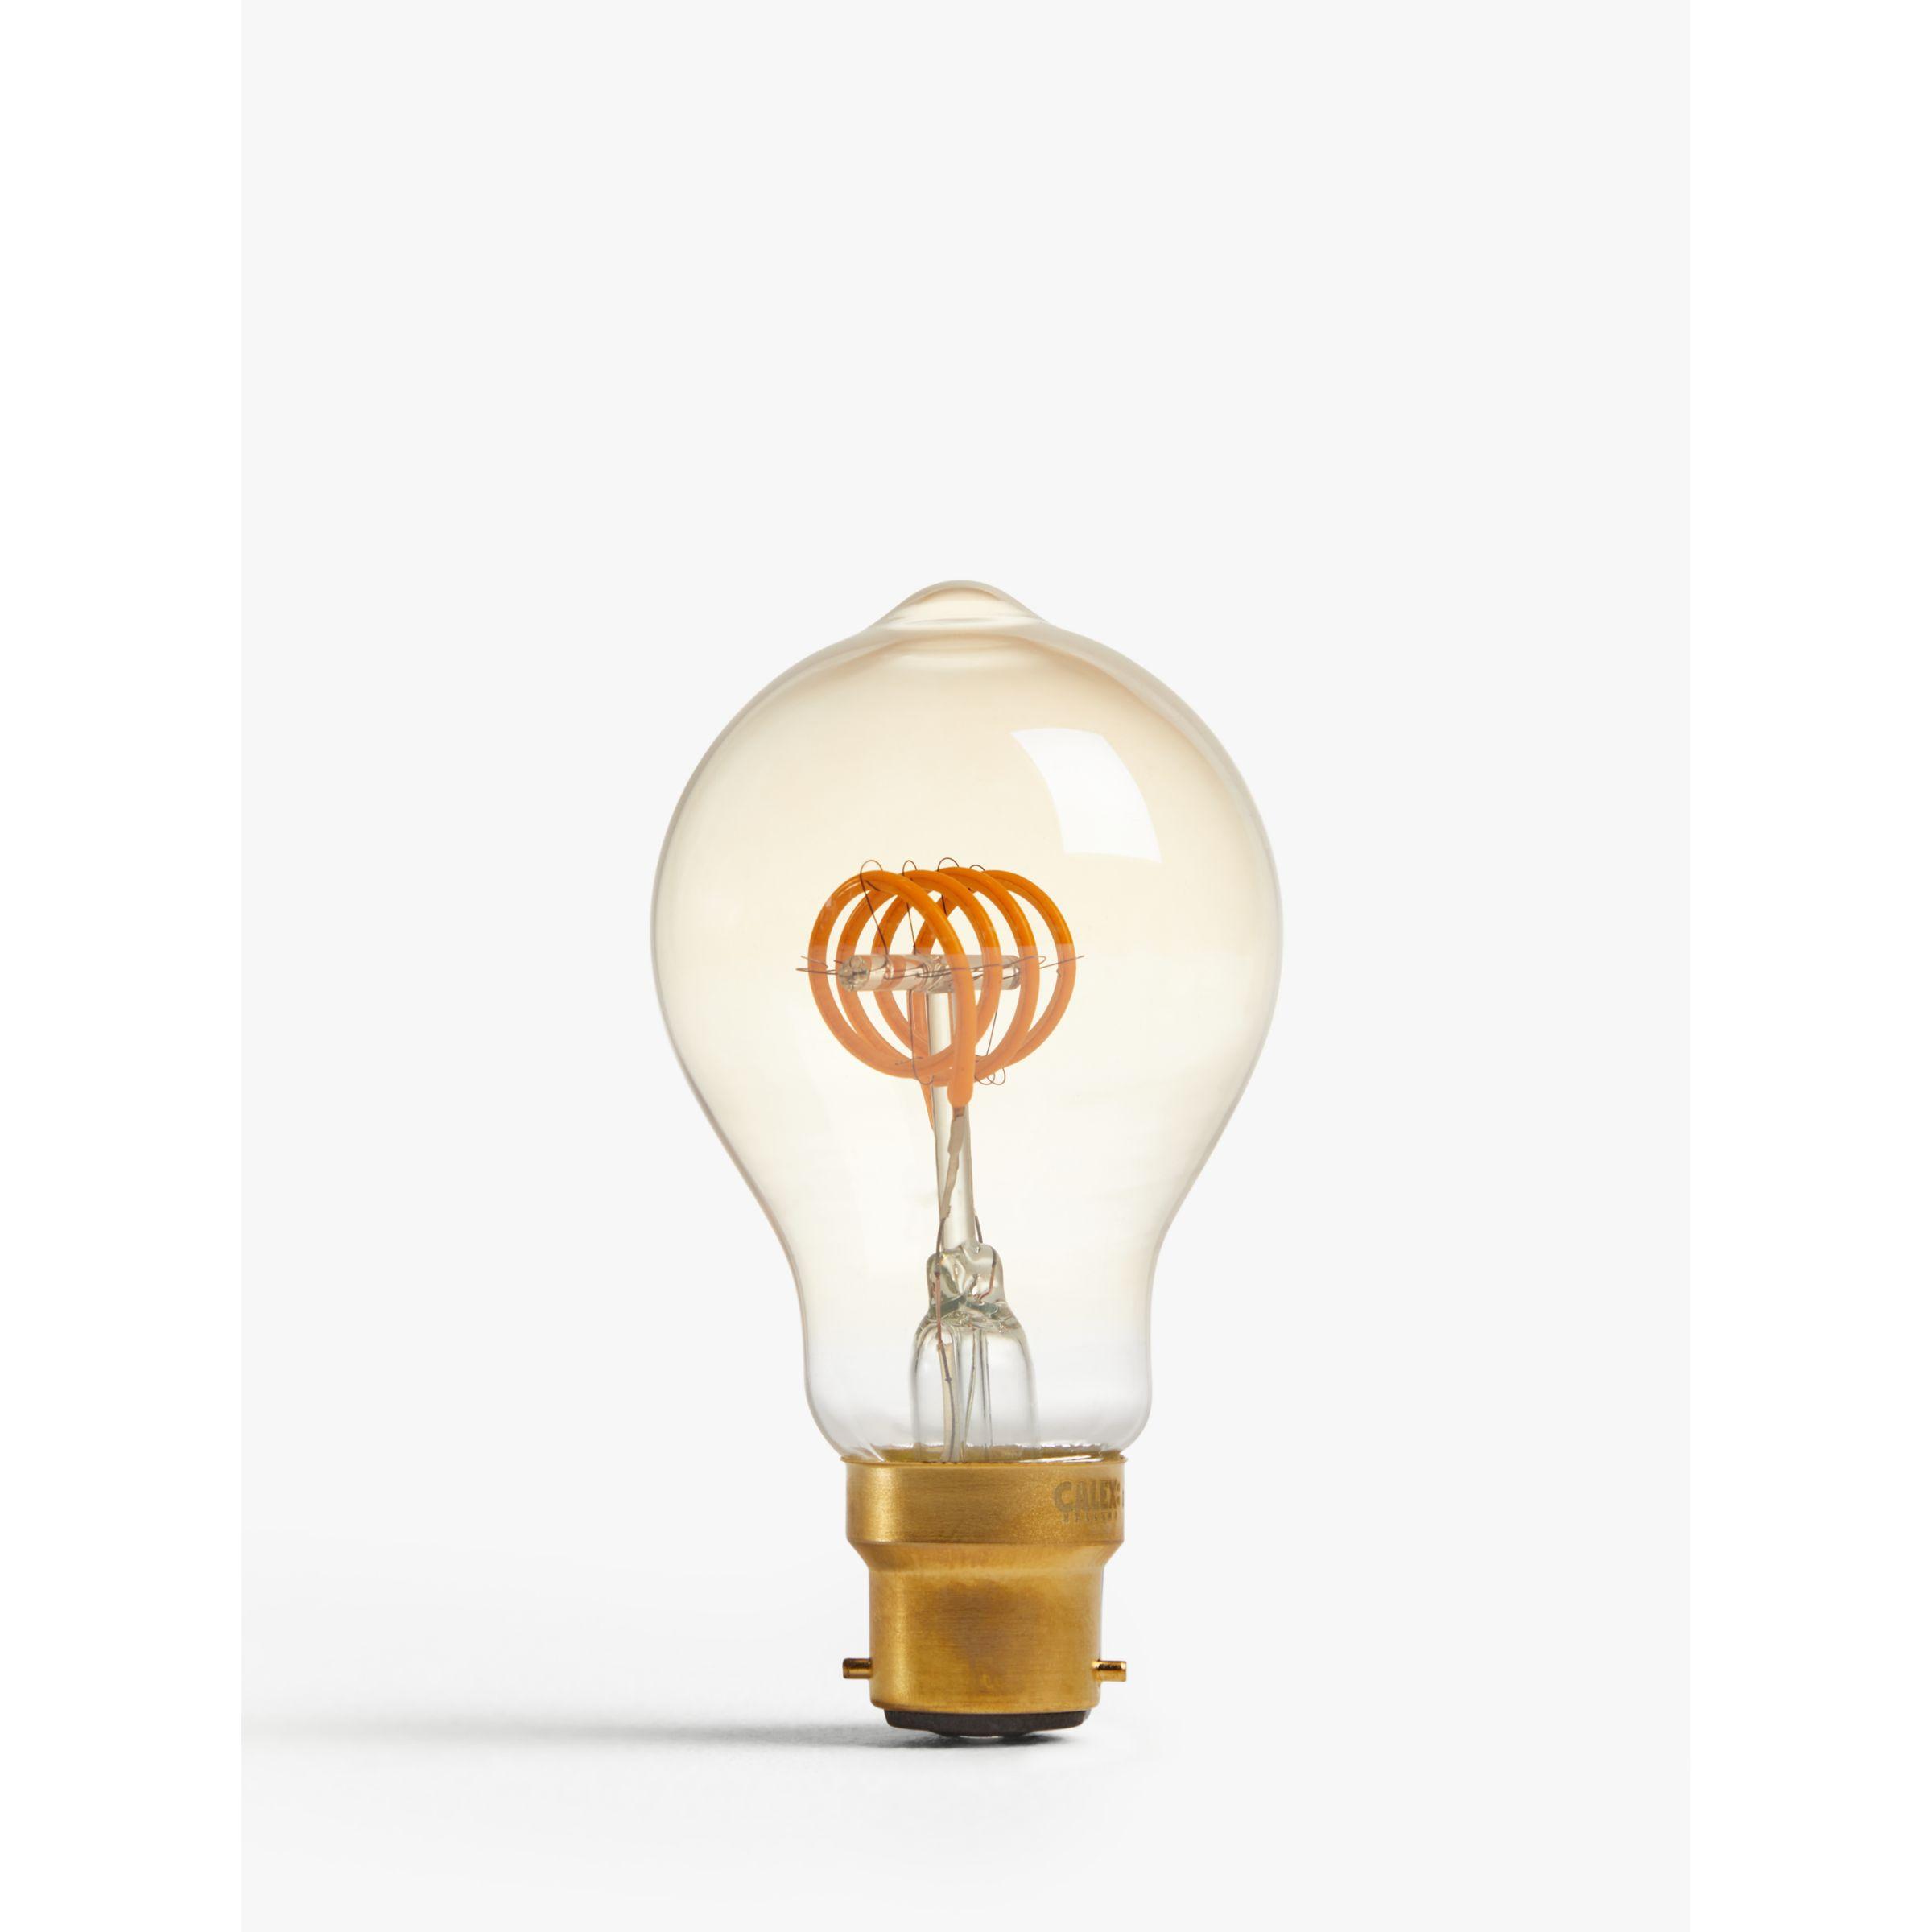 Calex Calex 4W ES LED Classic Filament Flex Bulb, Clear / Gold, Dimmable